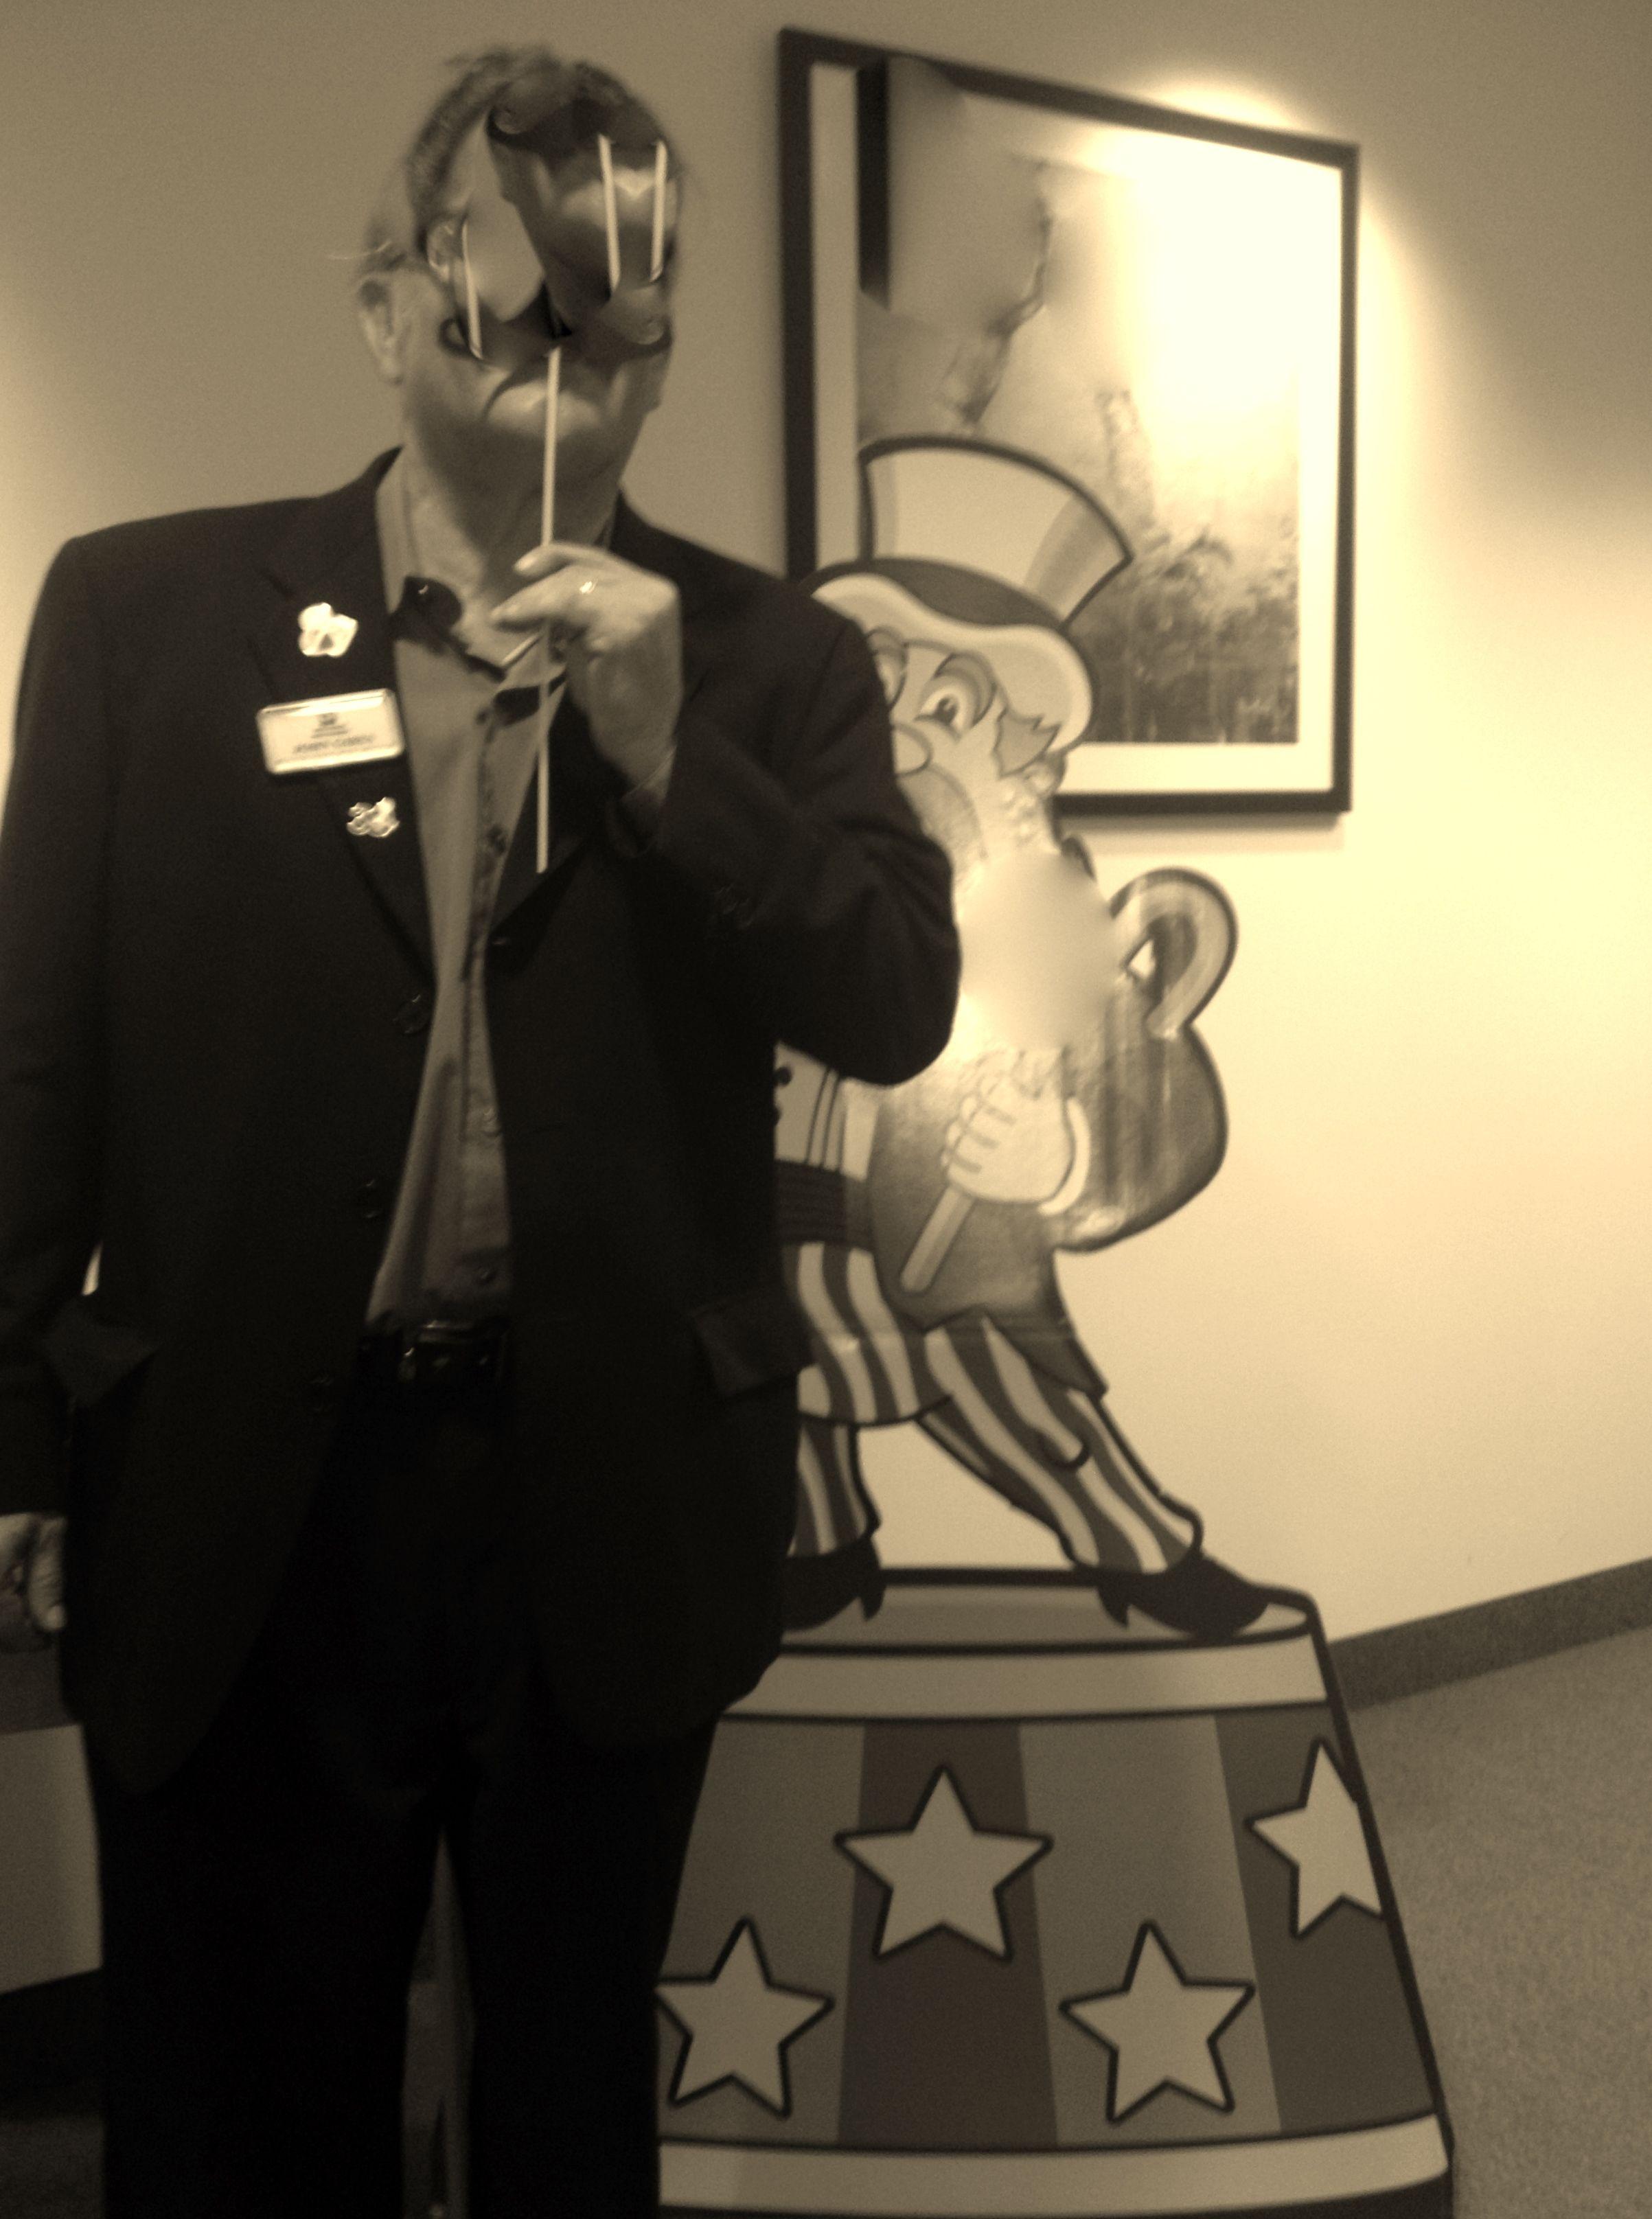 john at Miami children's hospital Hot air balloon rides